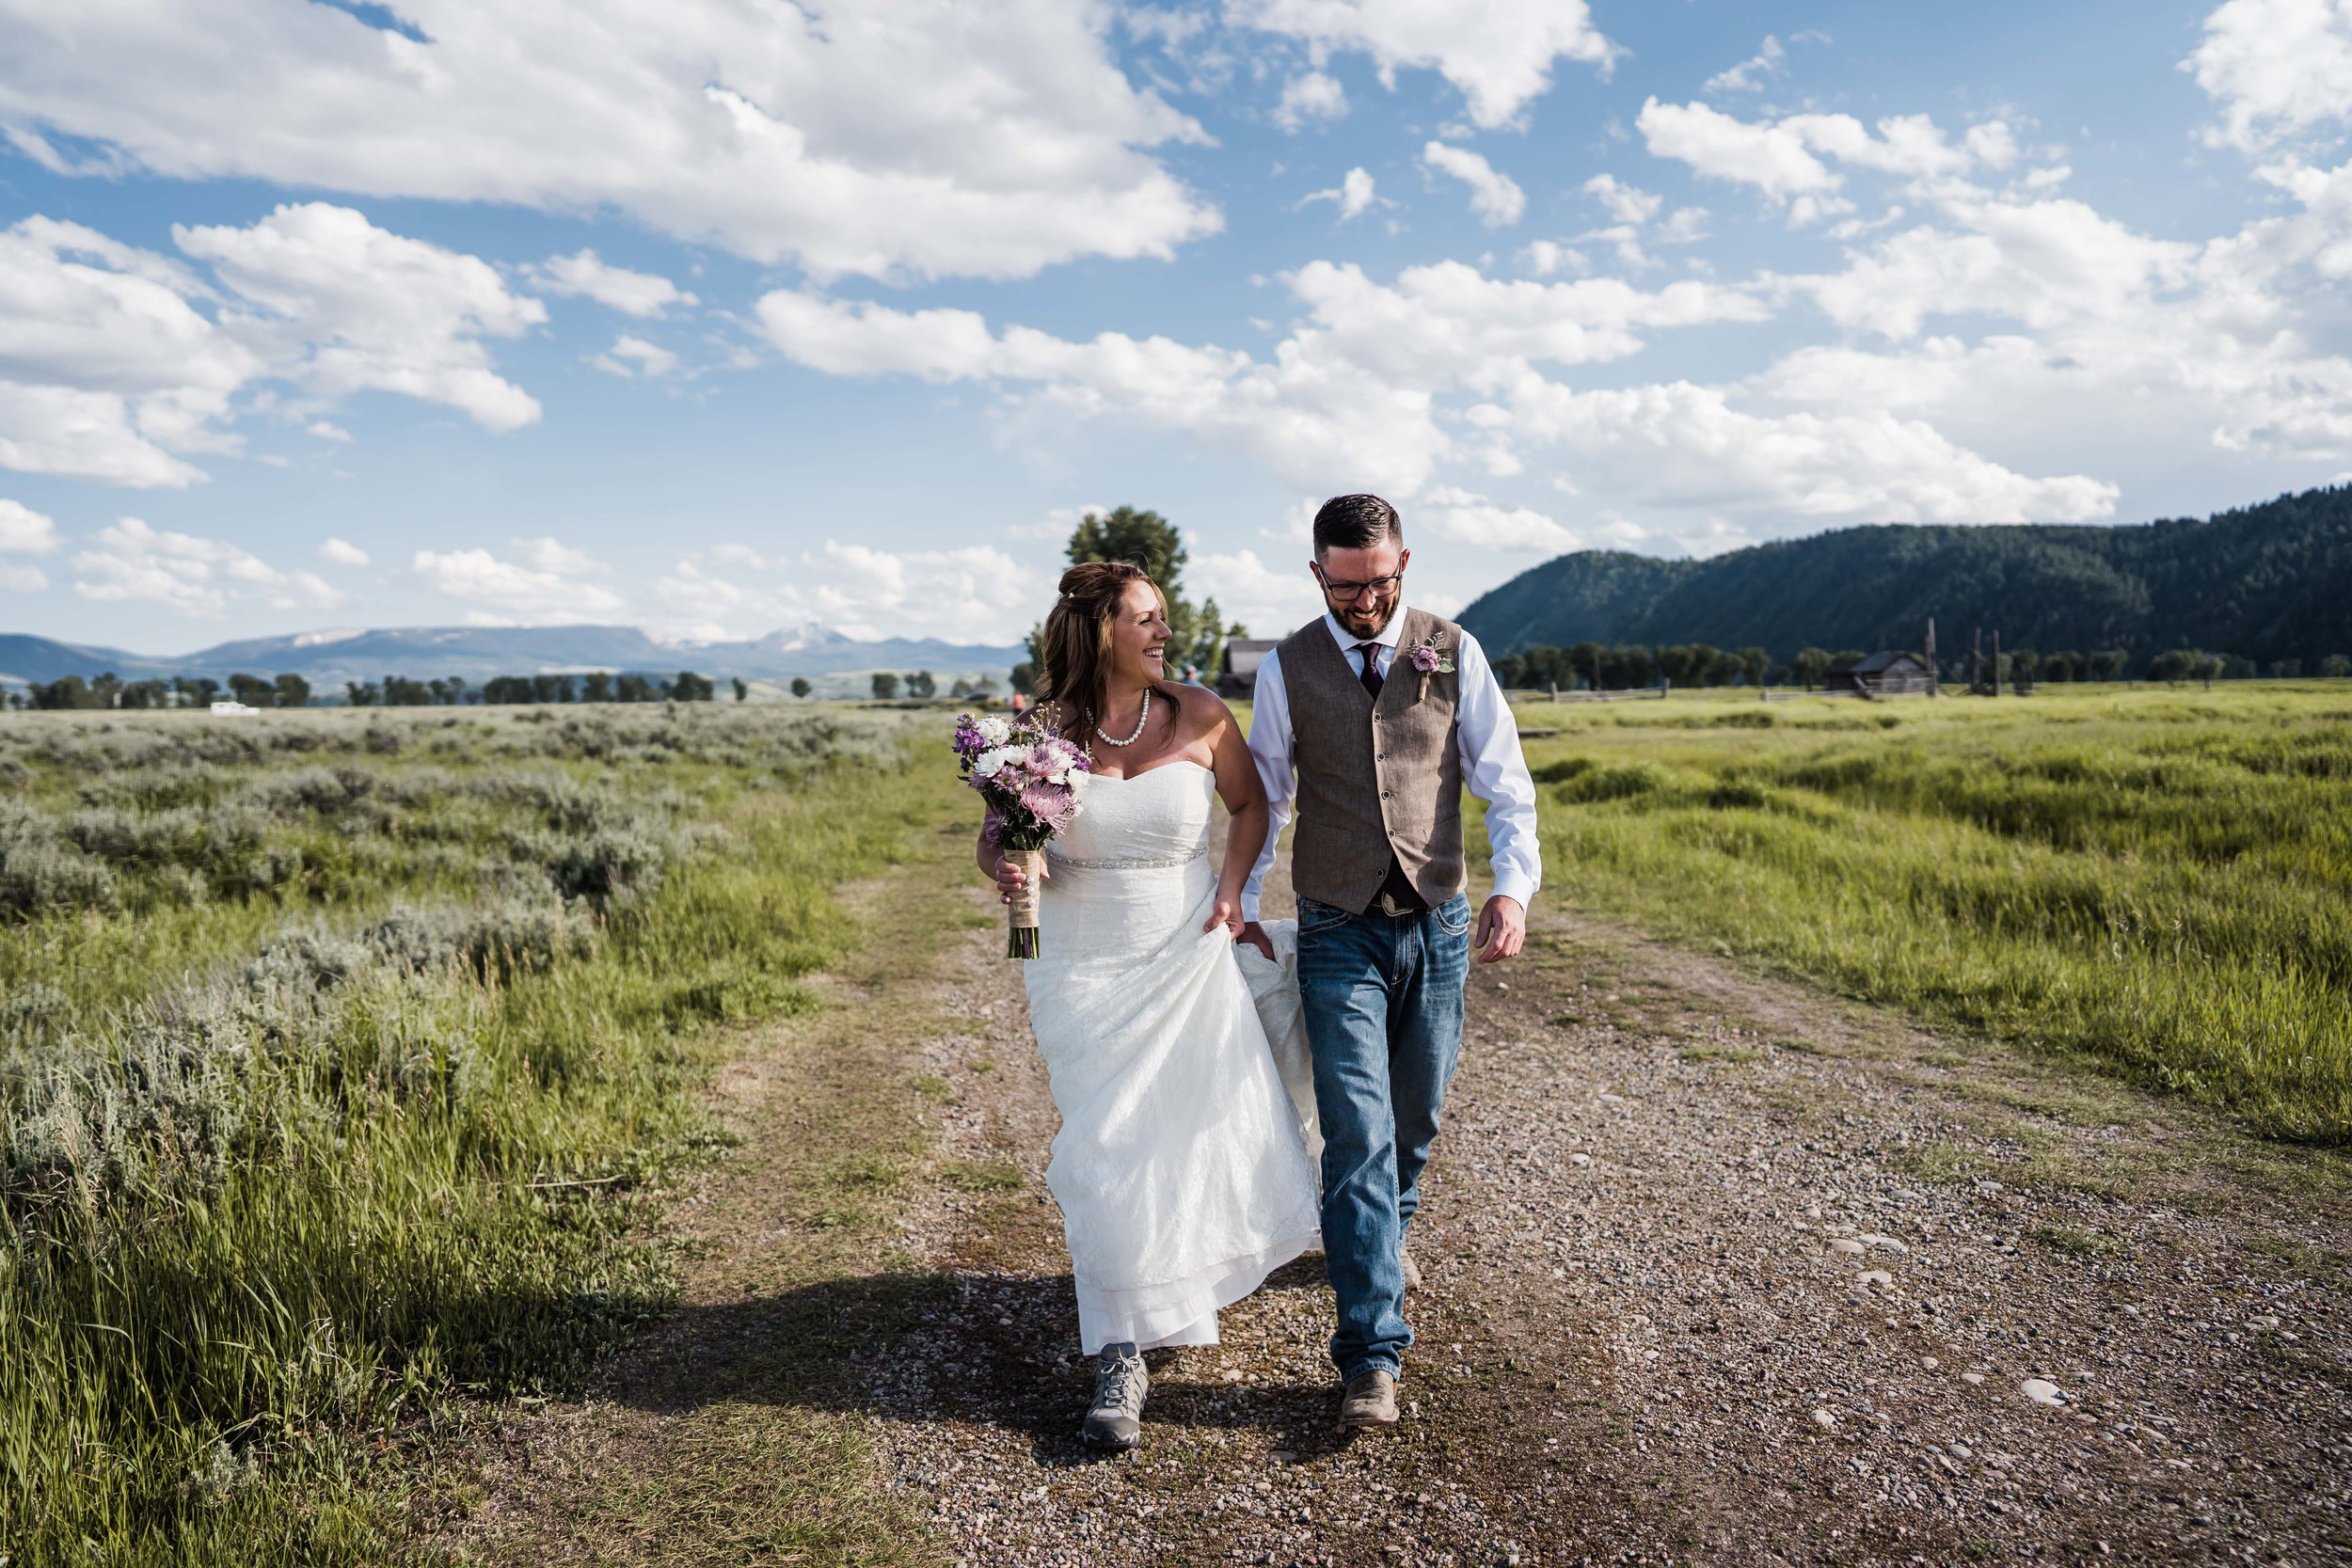 jackson hole adventure wedding photography at schwabachers landing in GTNP -DSD01422.jpg